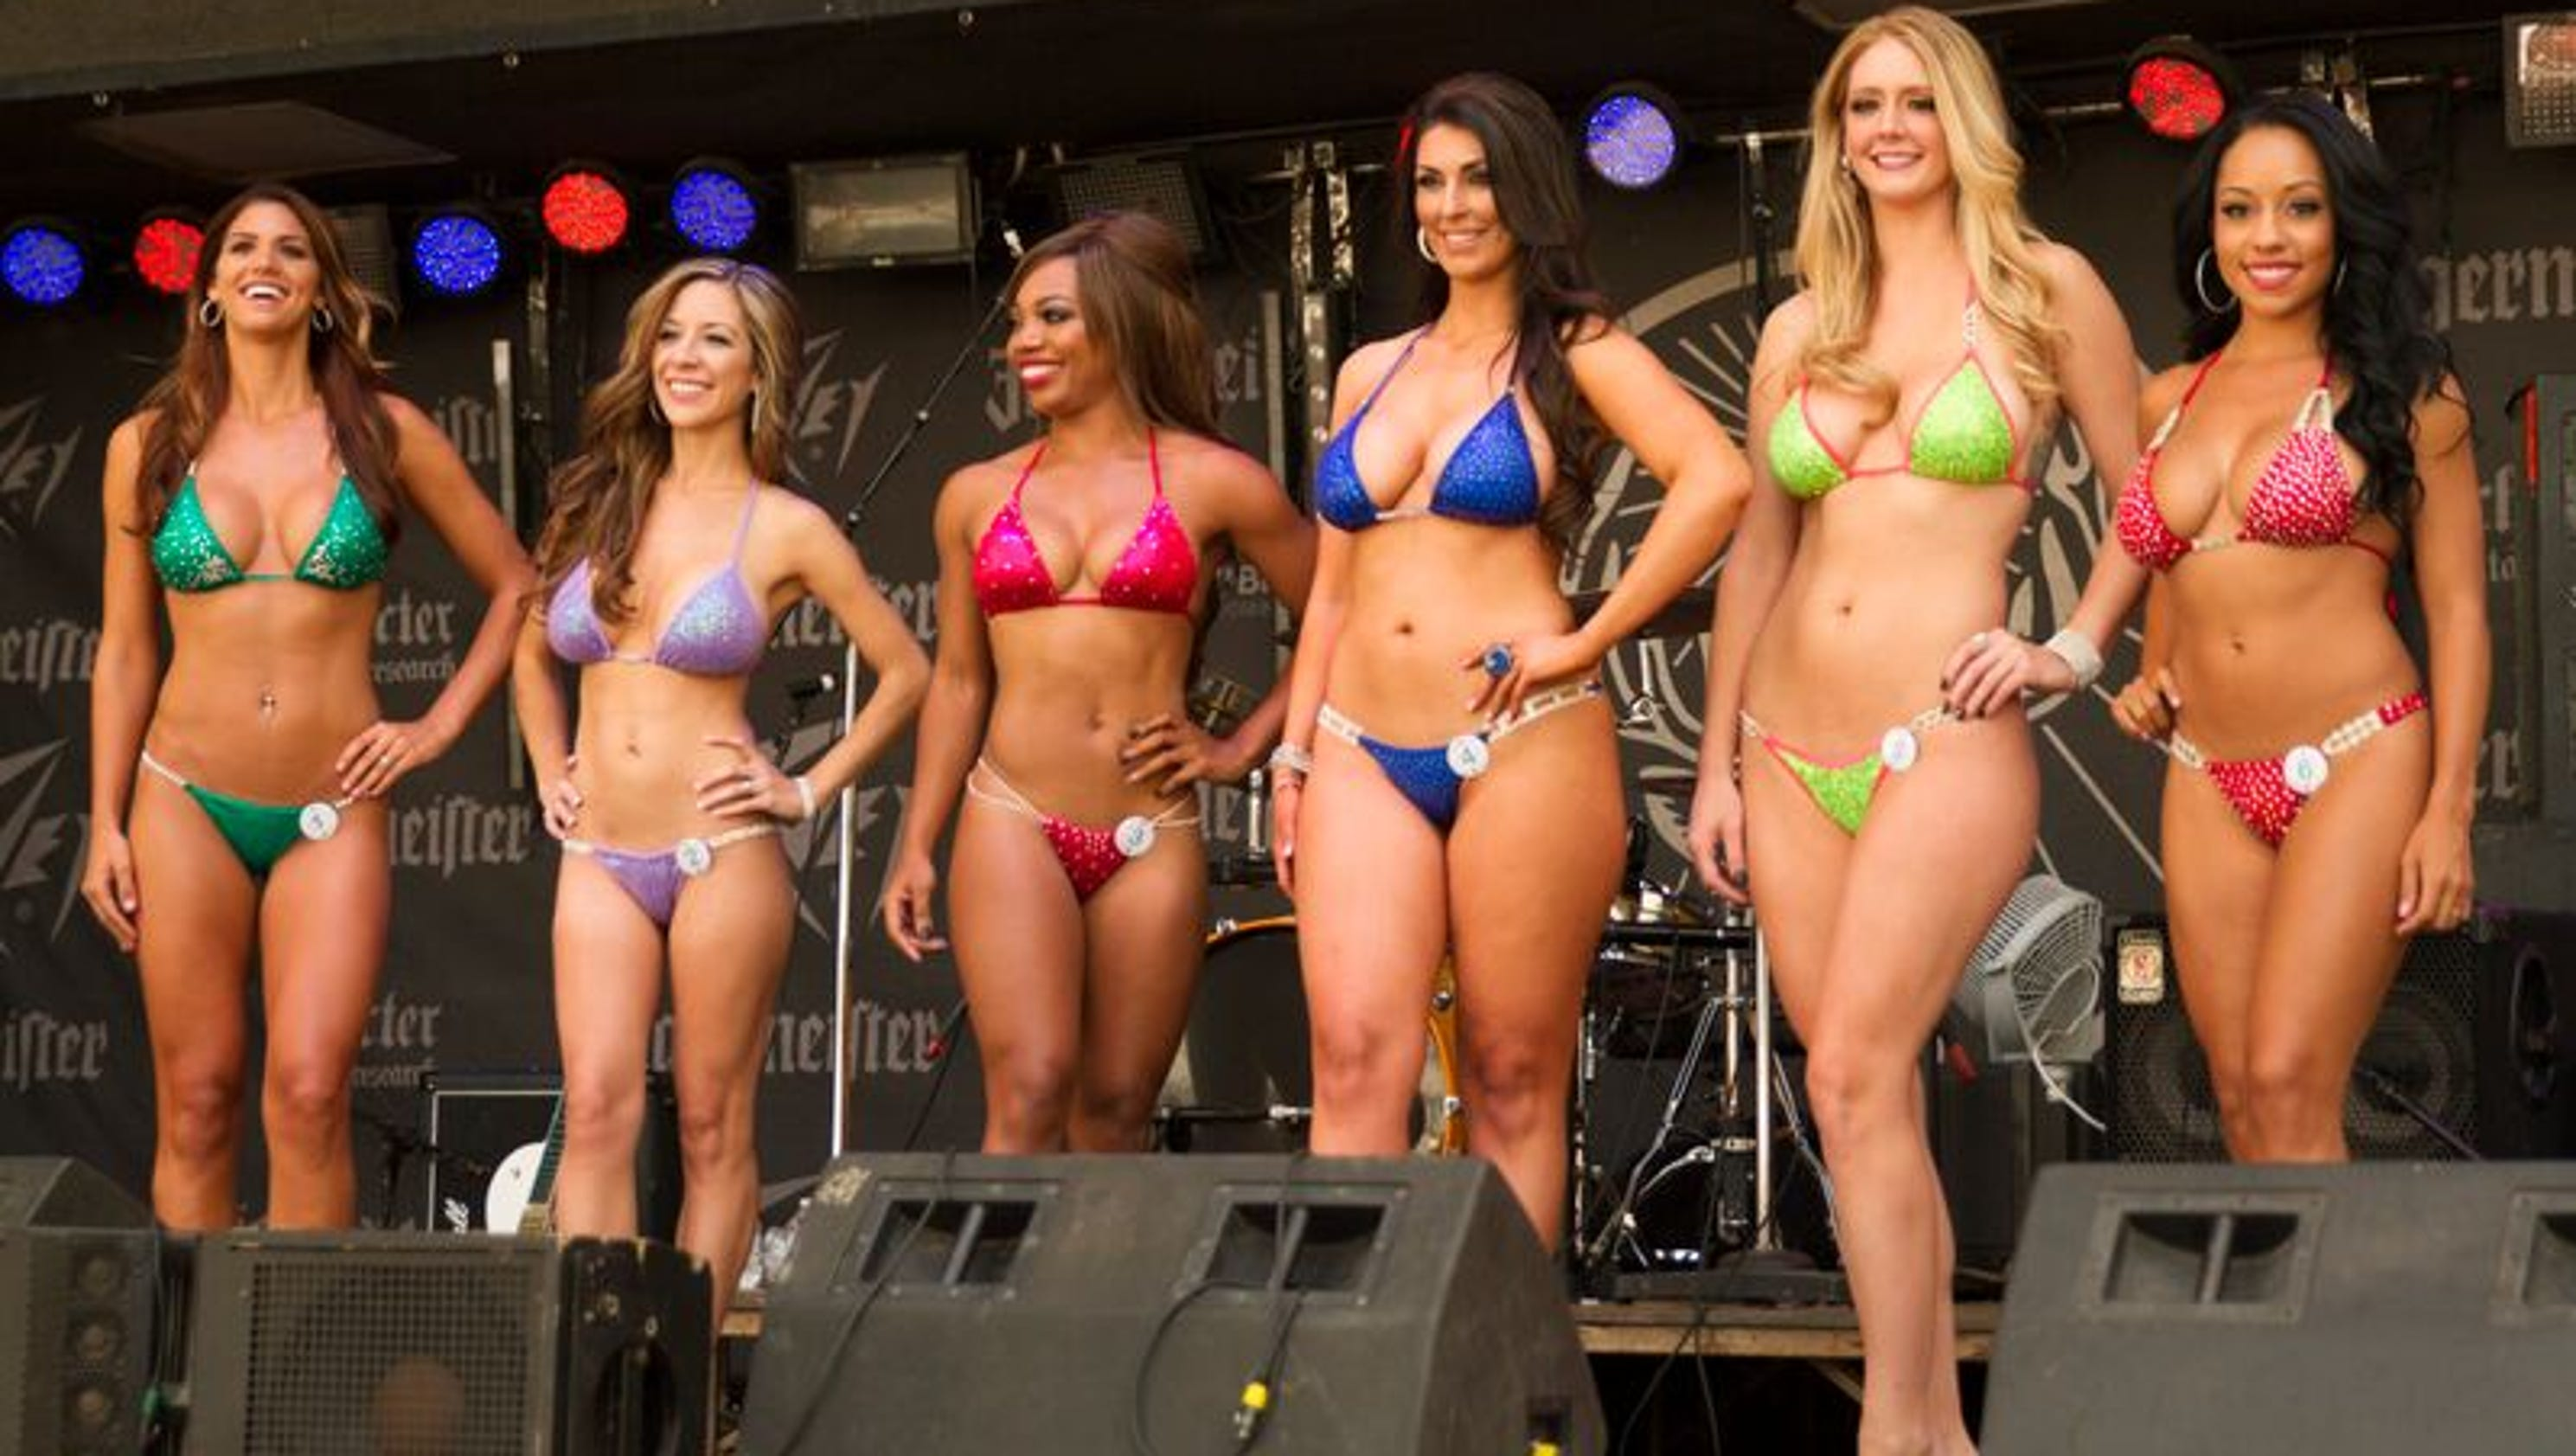 The texas bikini team